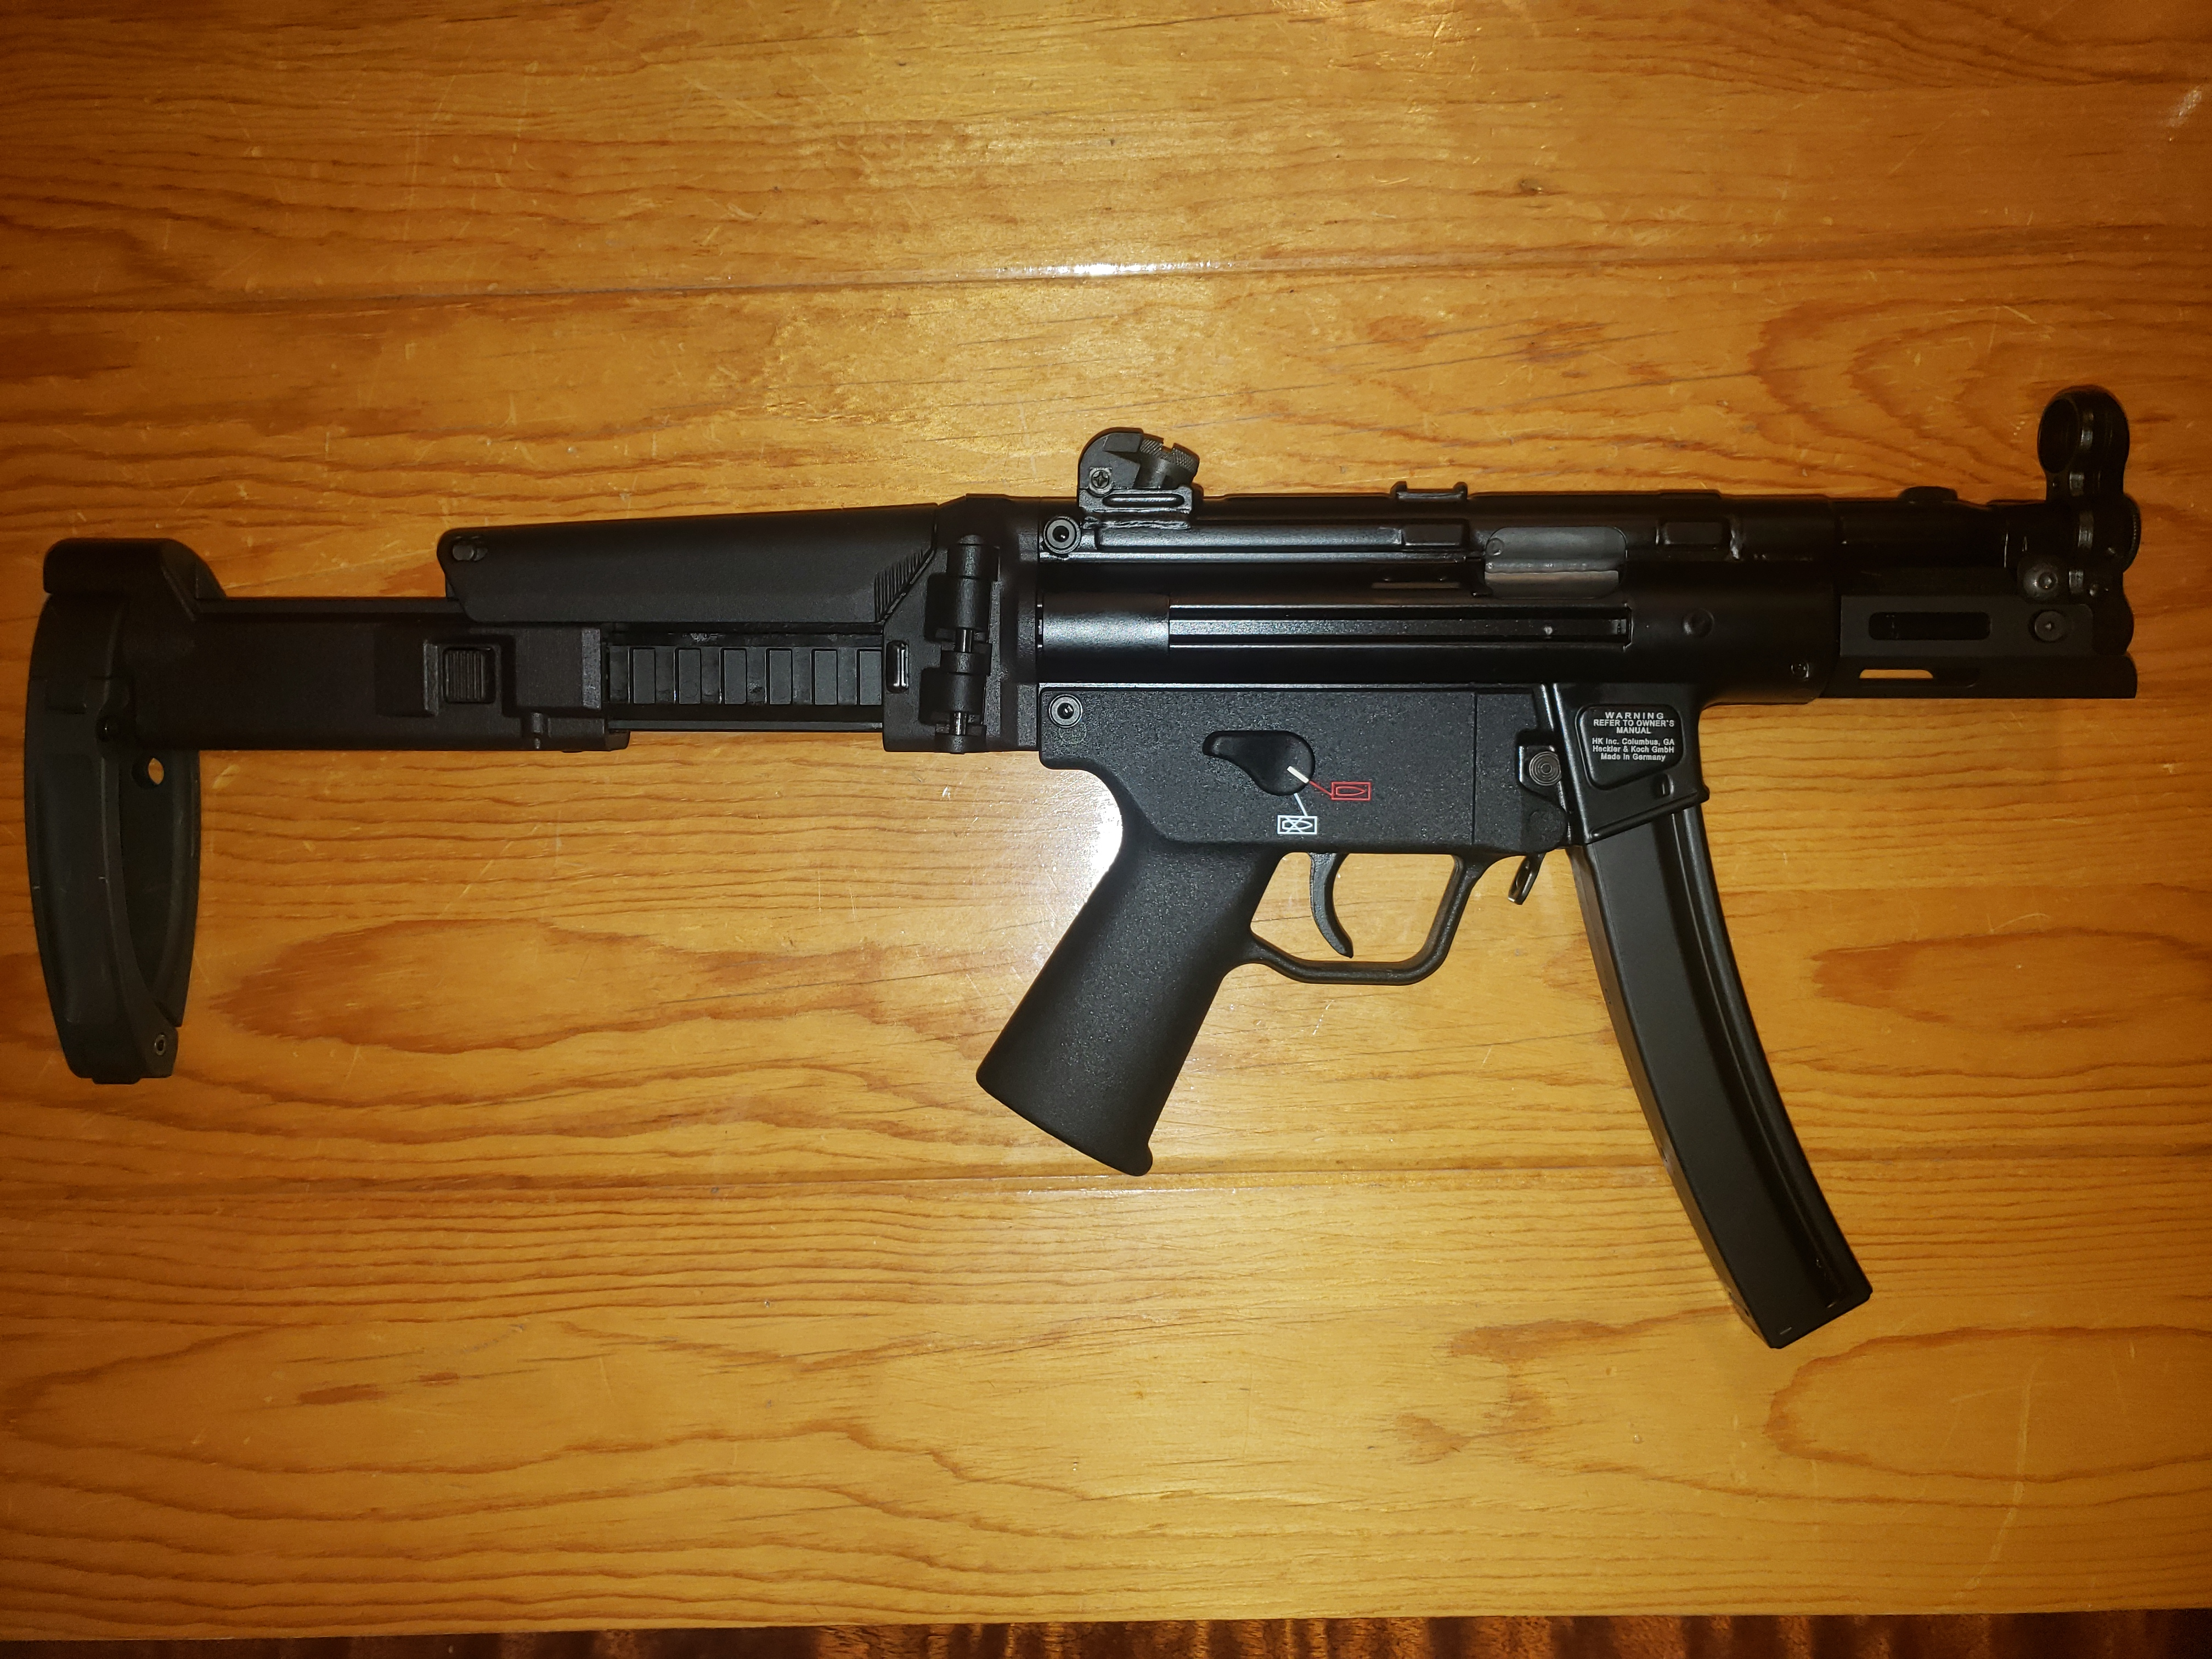 MP5 ACR Stock Adaptors In Production-20200226_182050_1582760074233.jpg